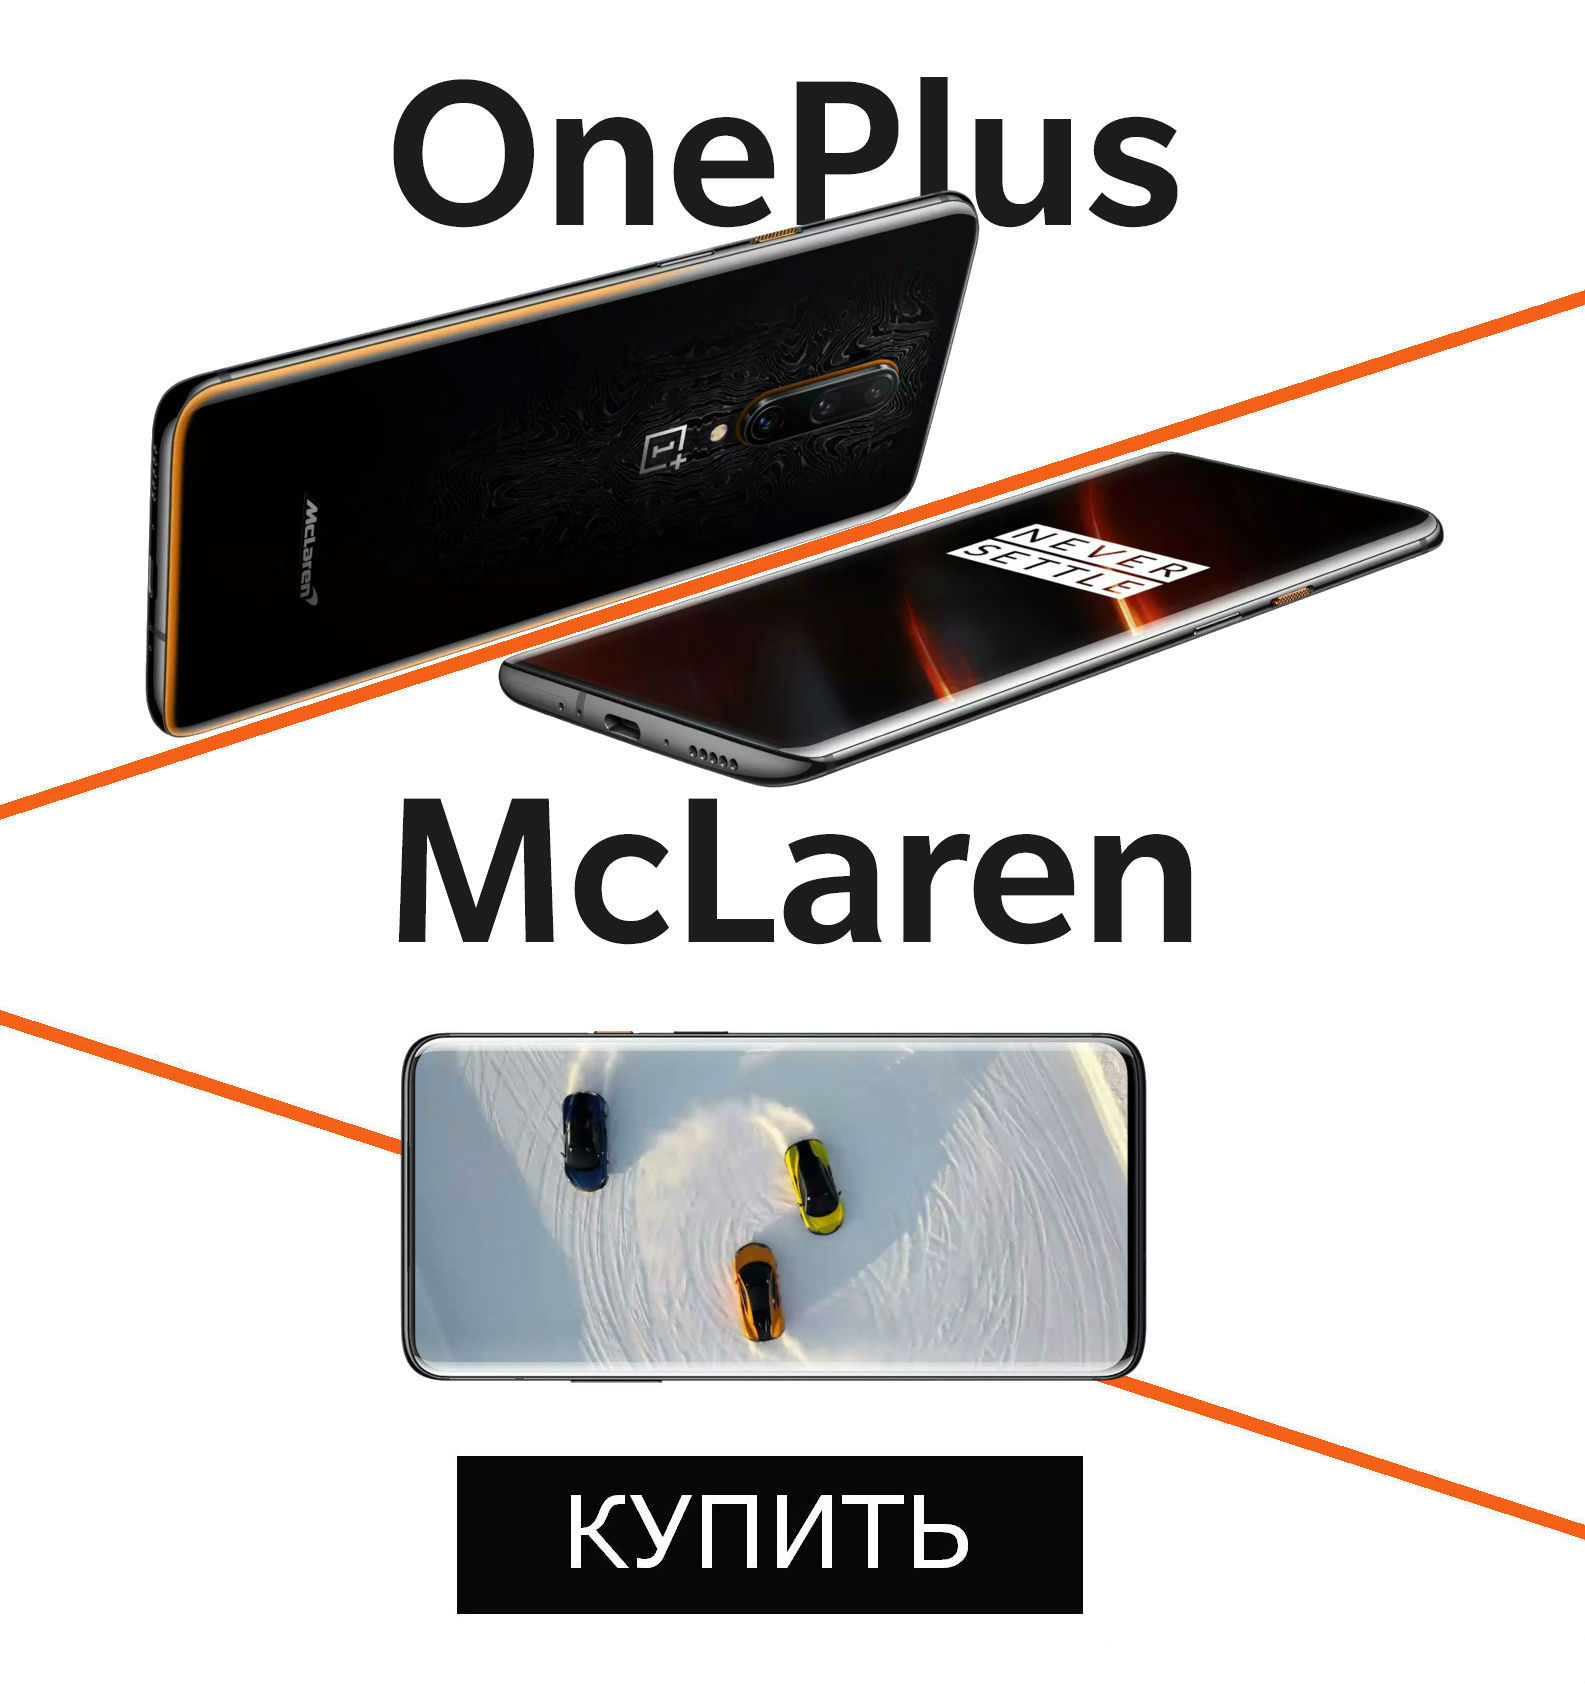 OnePlus 7T McLaren купить